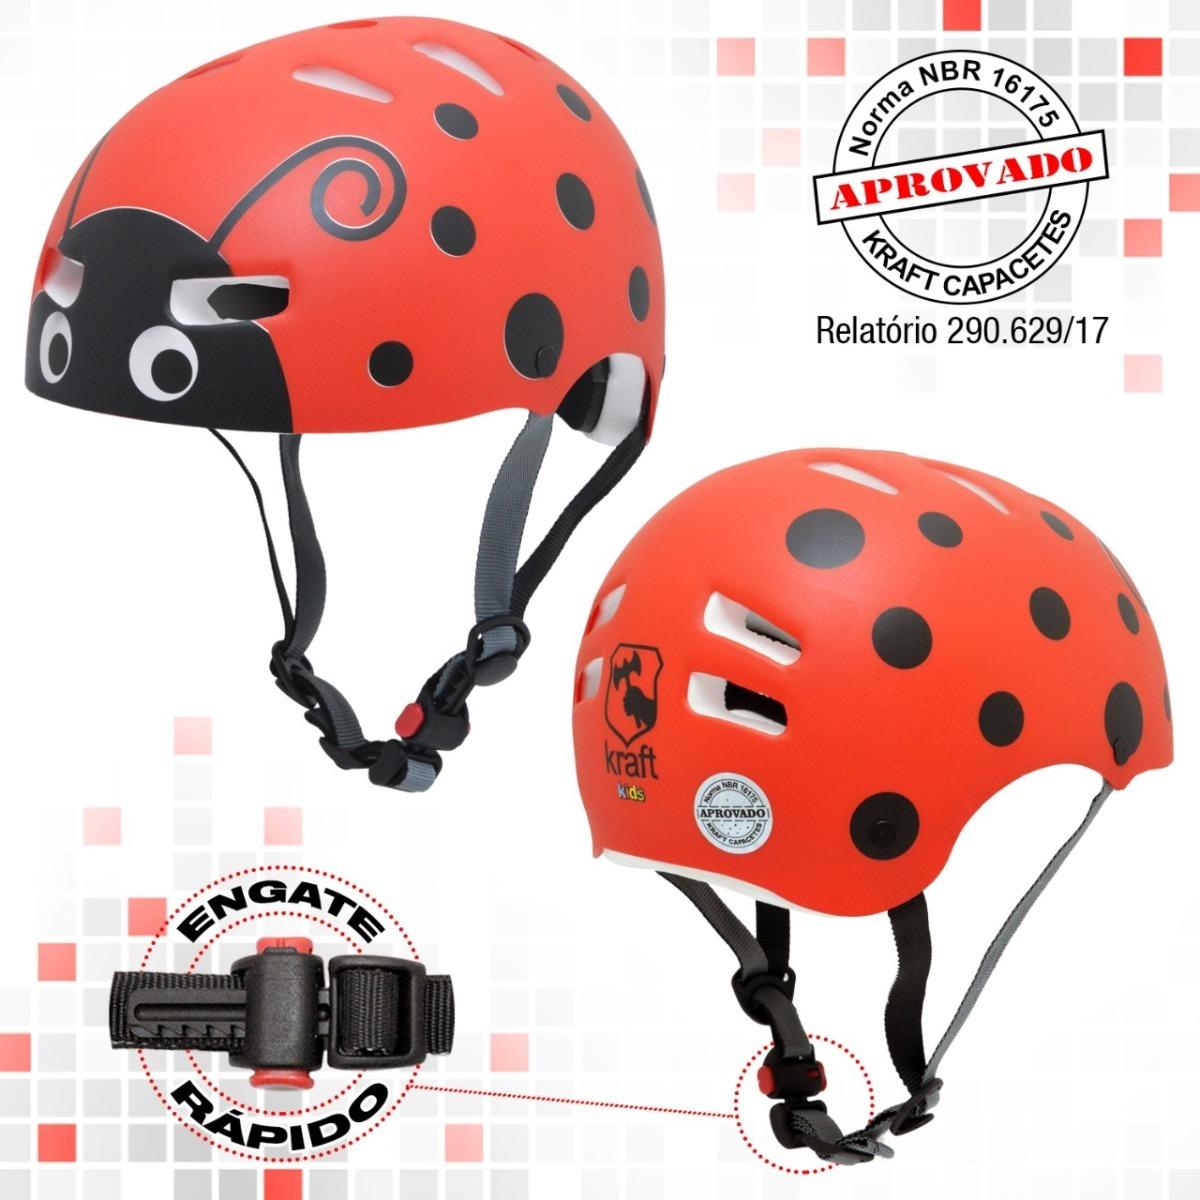 2535e700f5c Capacete Kraft Bike Skate Patins Joaninha - Frete Gratis - R  144